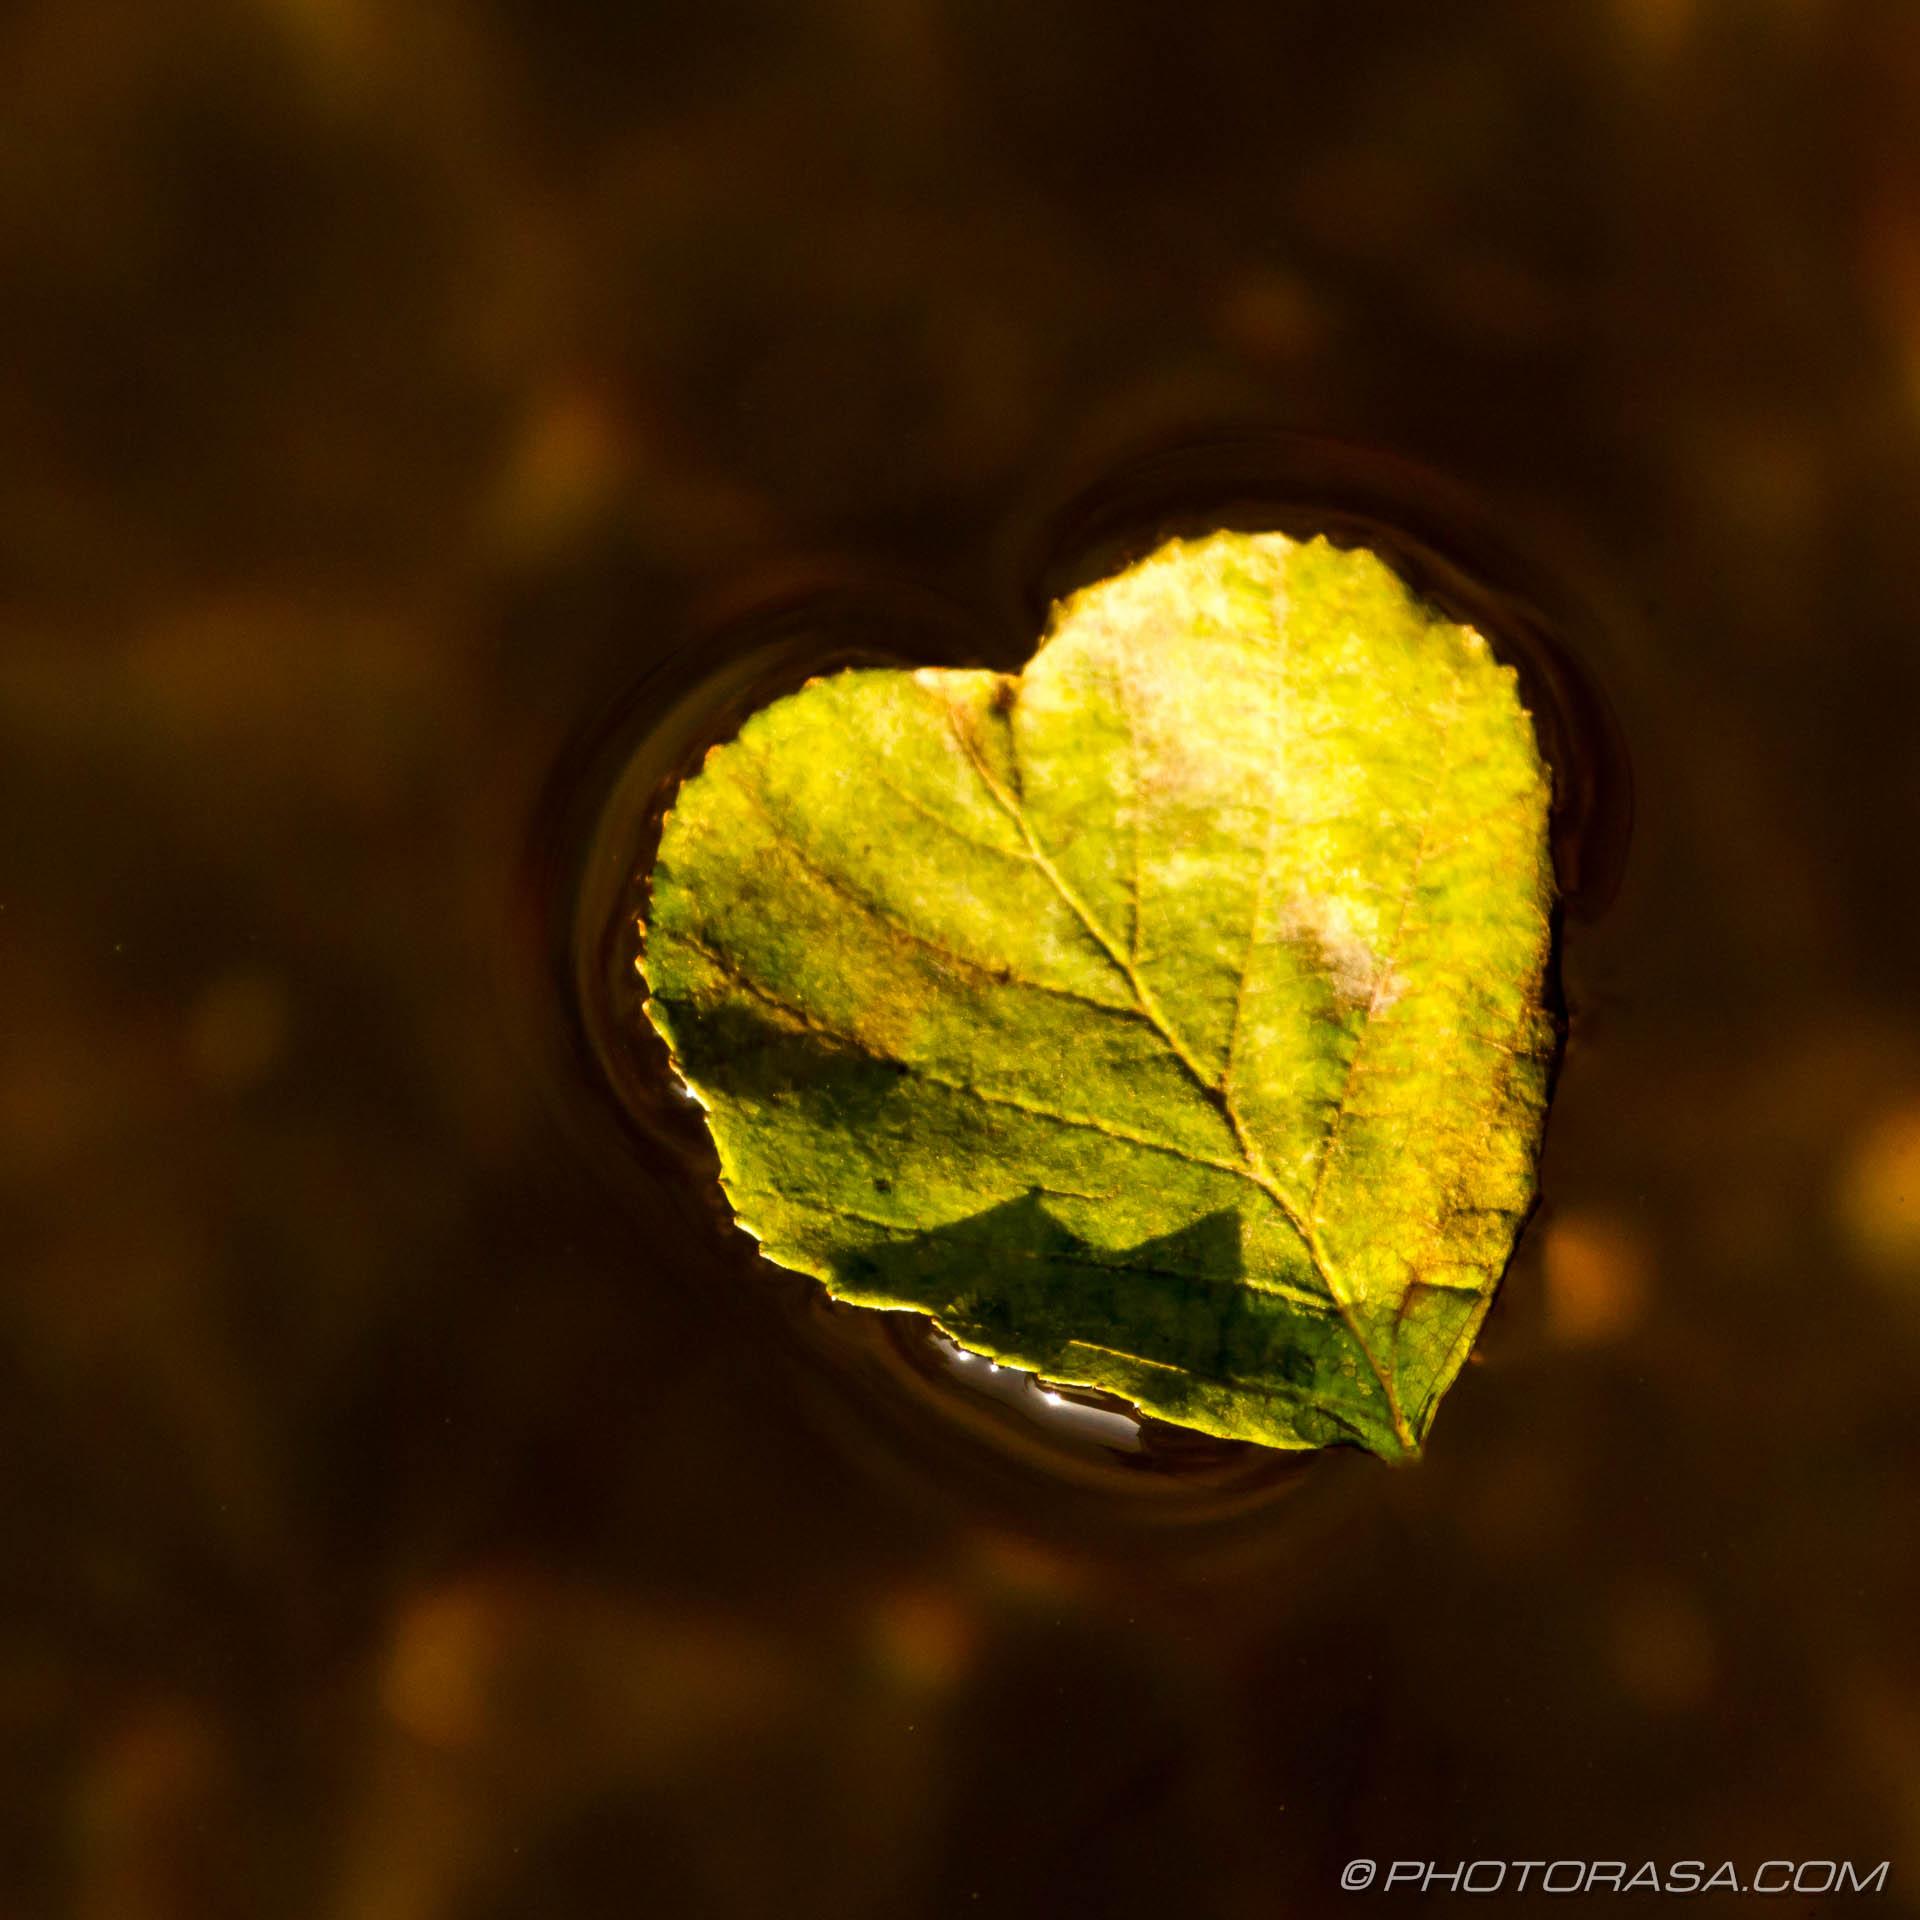 http://photorasa.com/autumn-leaves-sunlight/heart-shaped-leaf-on-water/